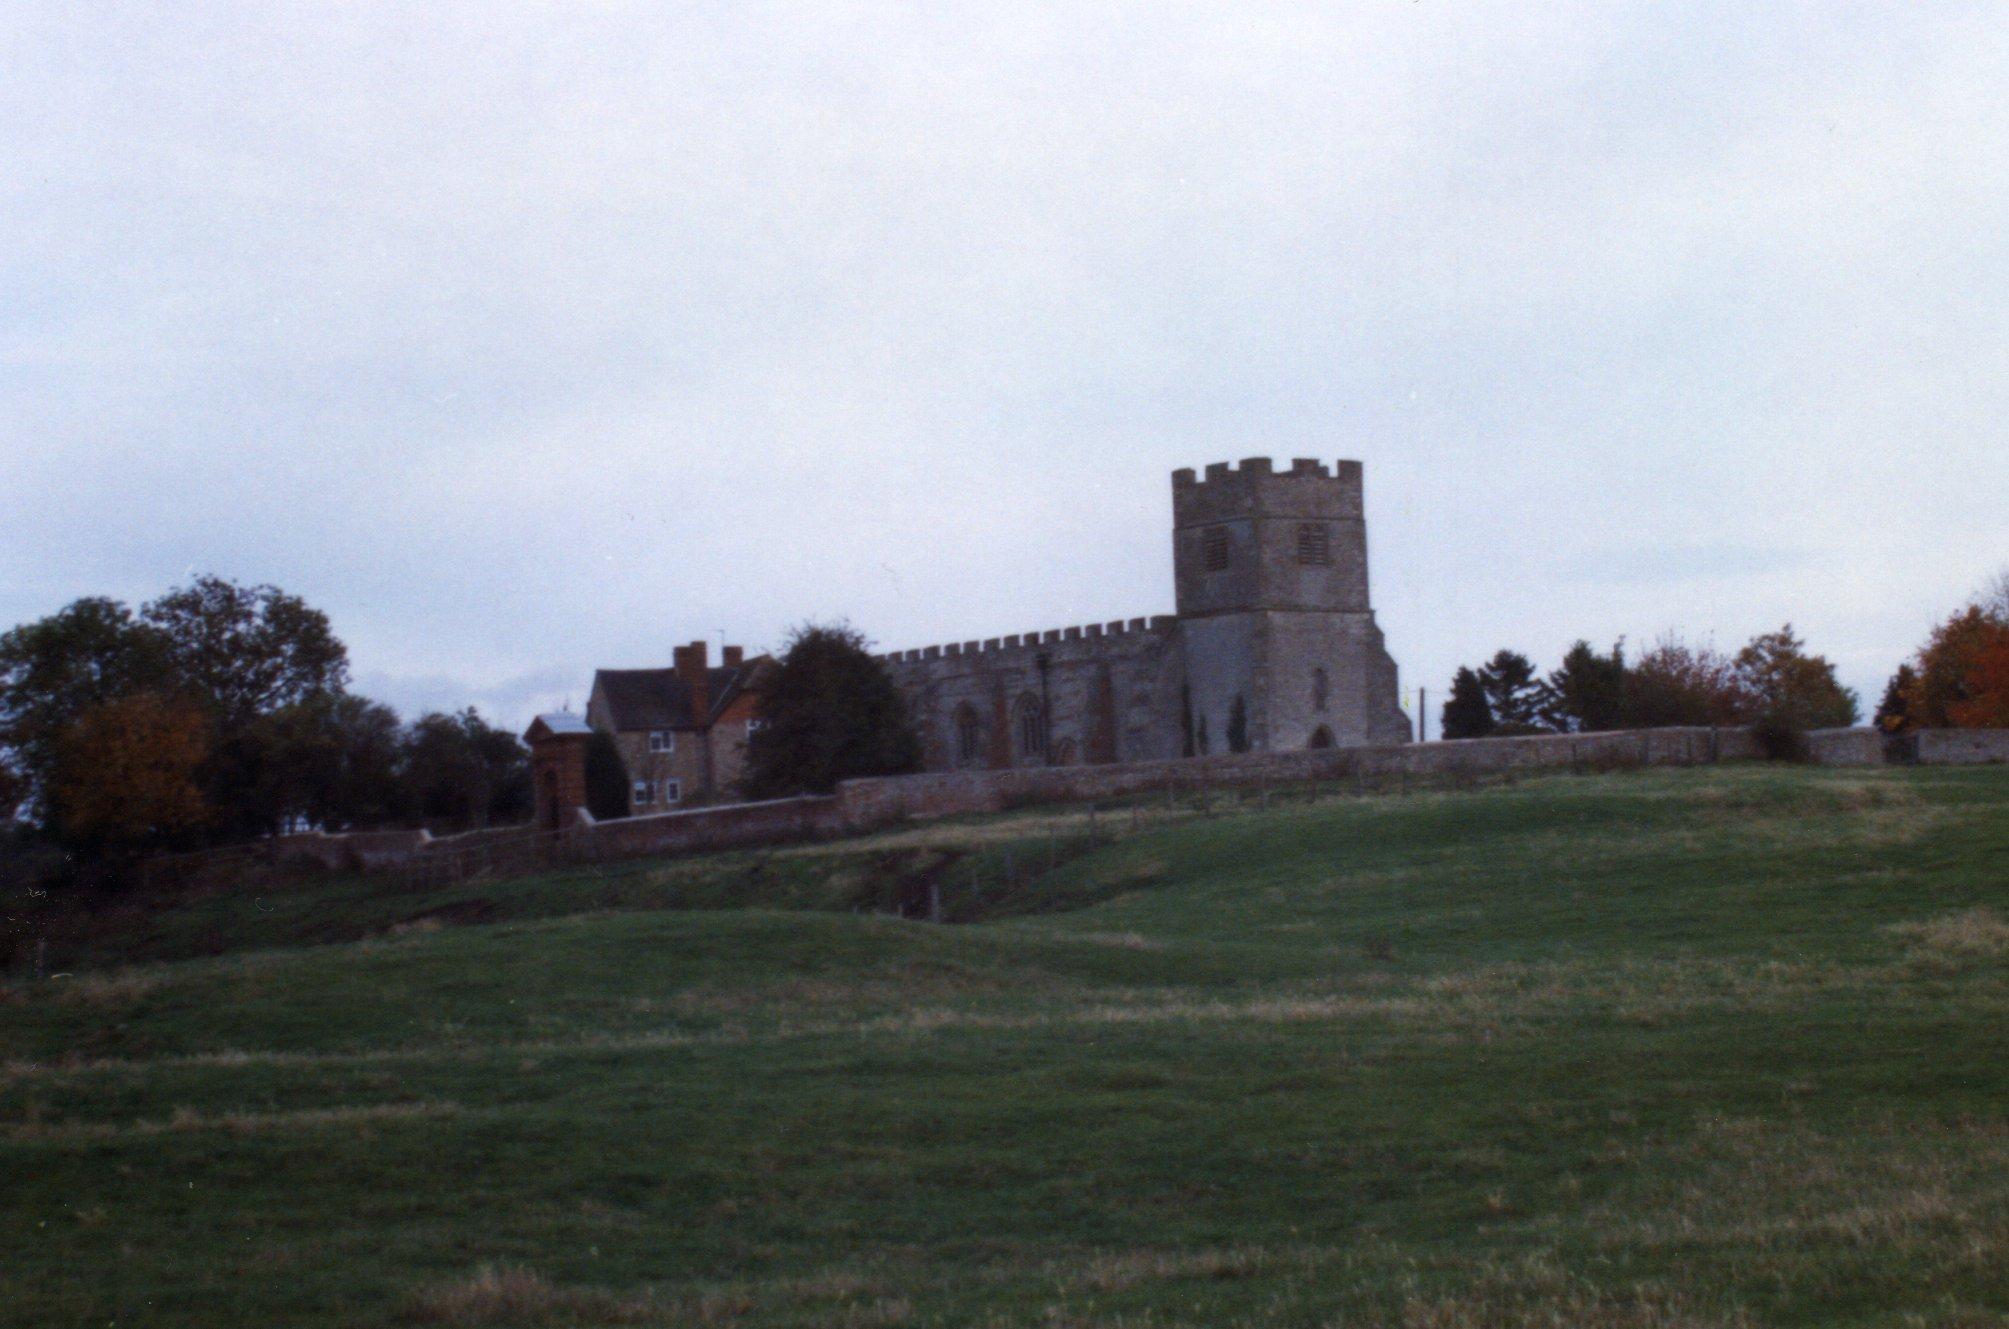 St. Giles, Chesterton